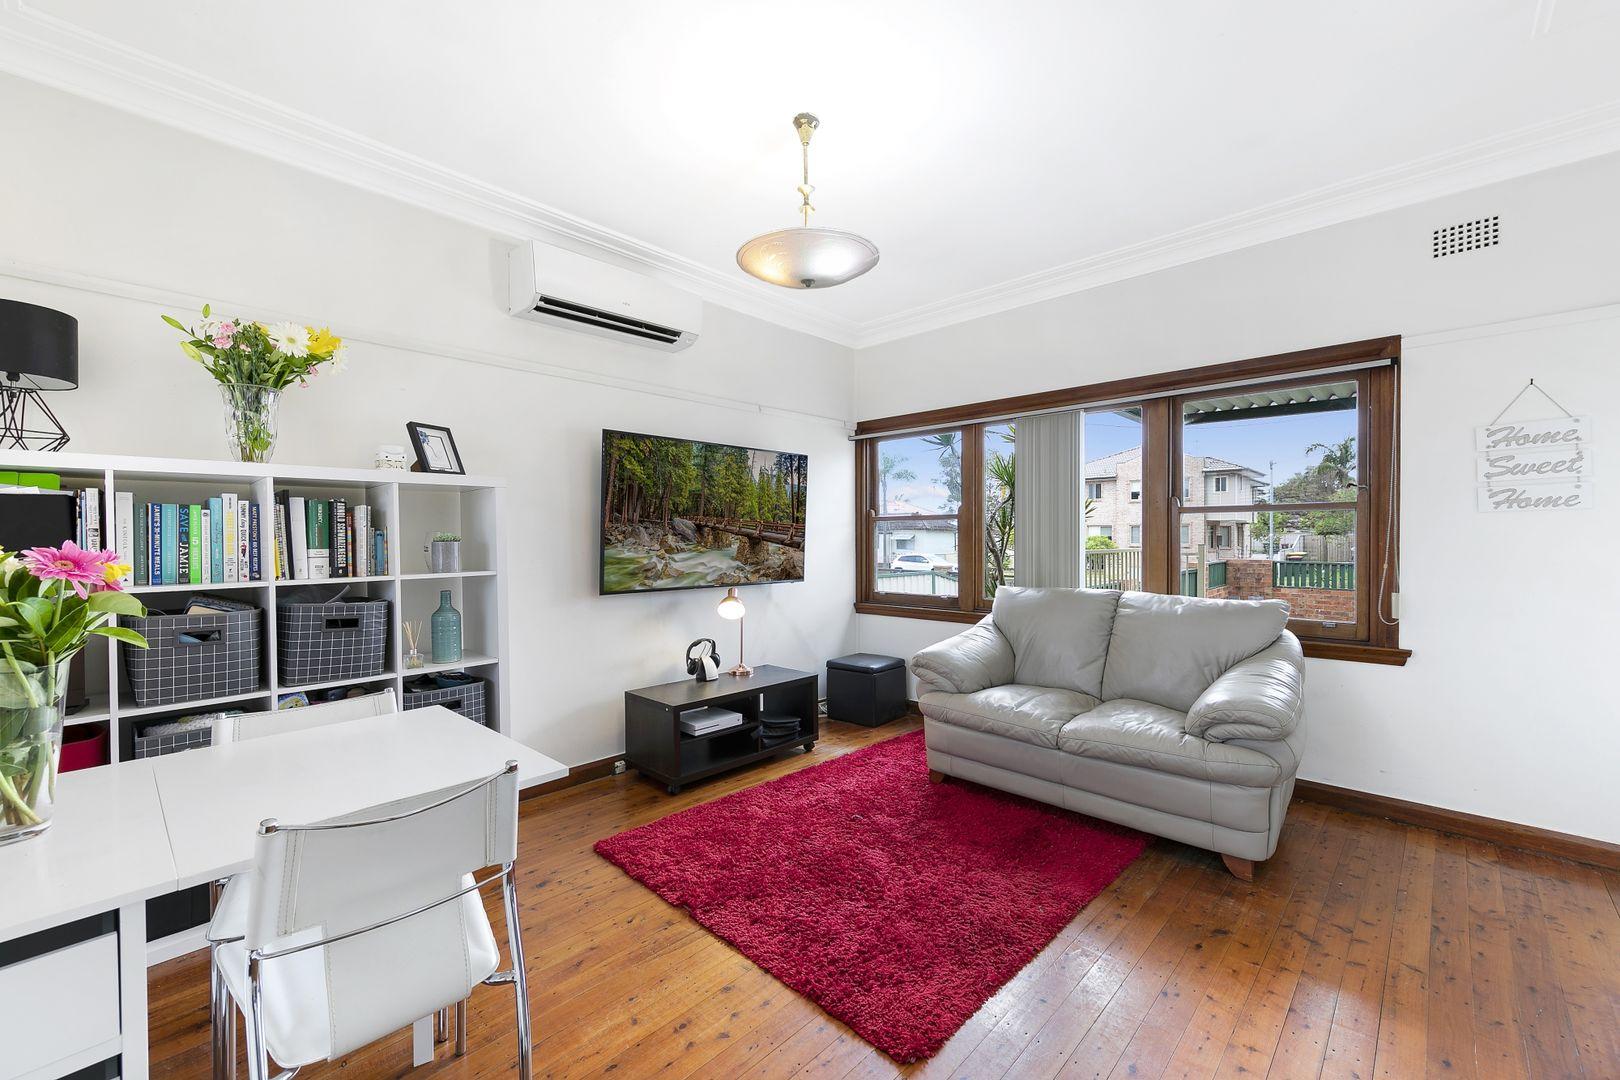 1/87 Swadling Street, Long Jetty NSW 2261, Image 1